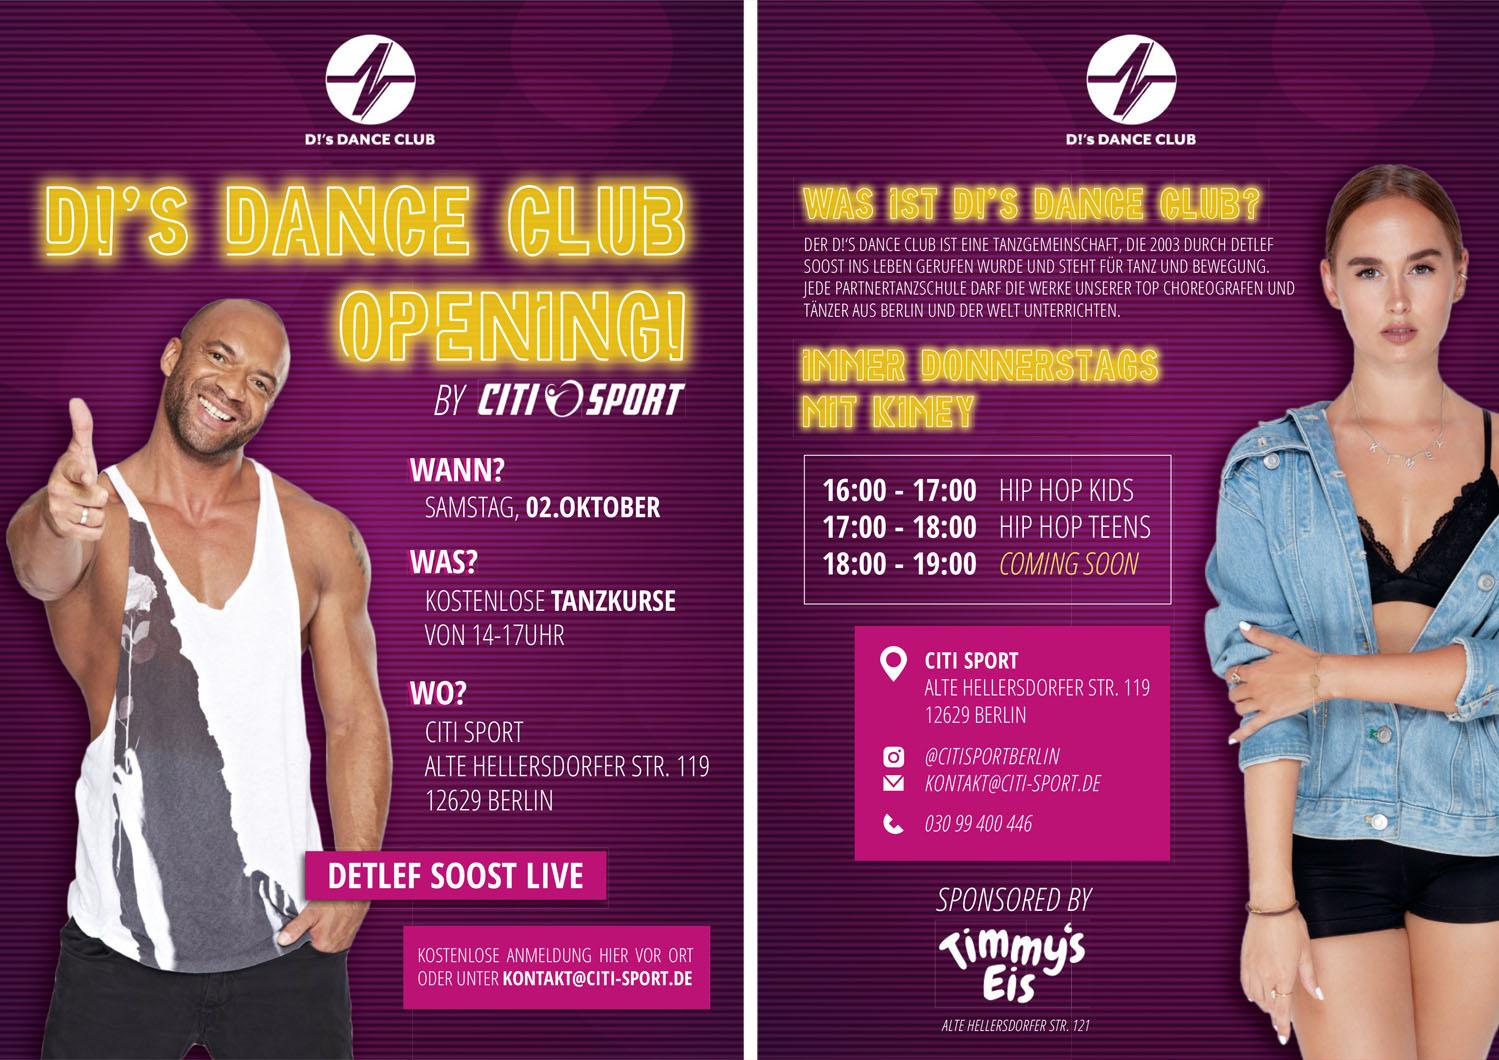 Citisport Danceclub